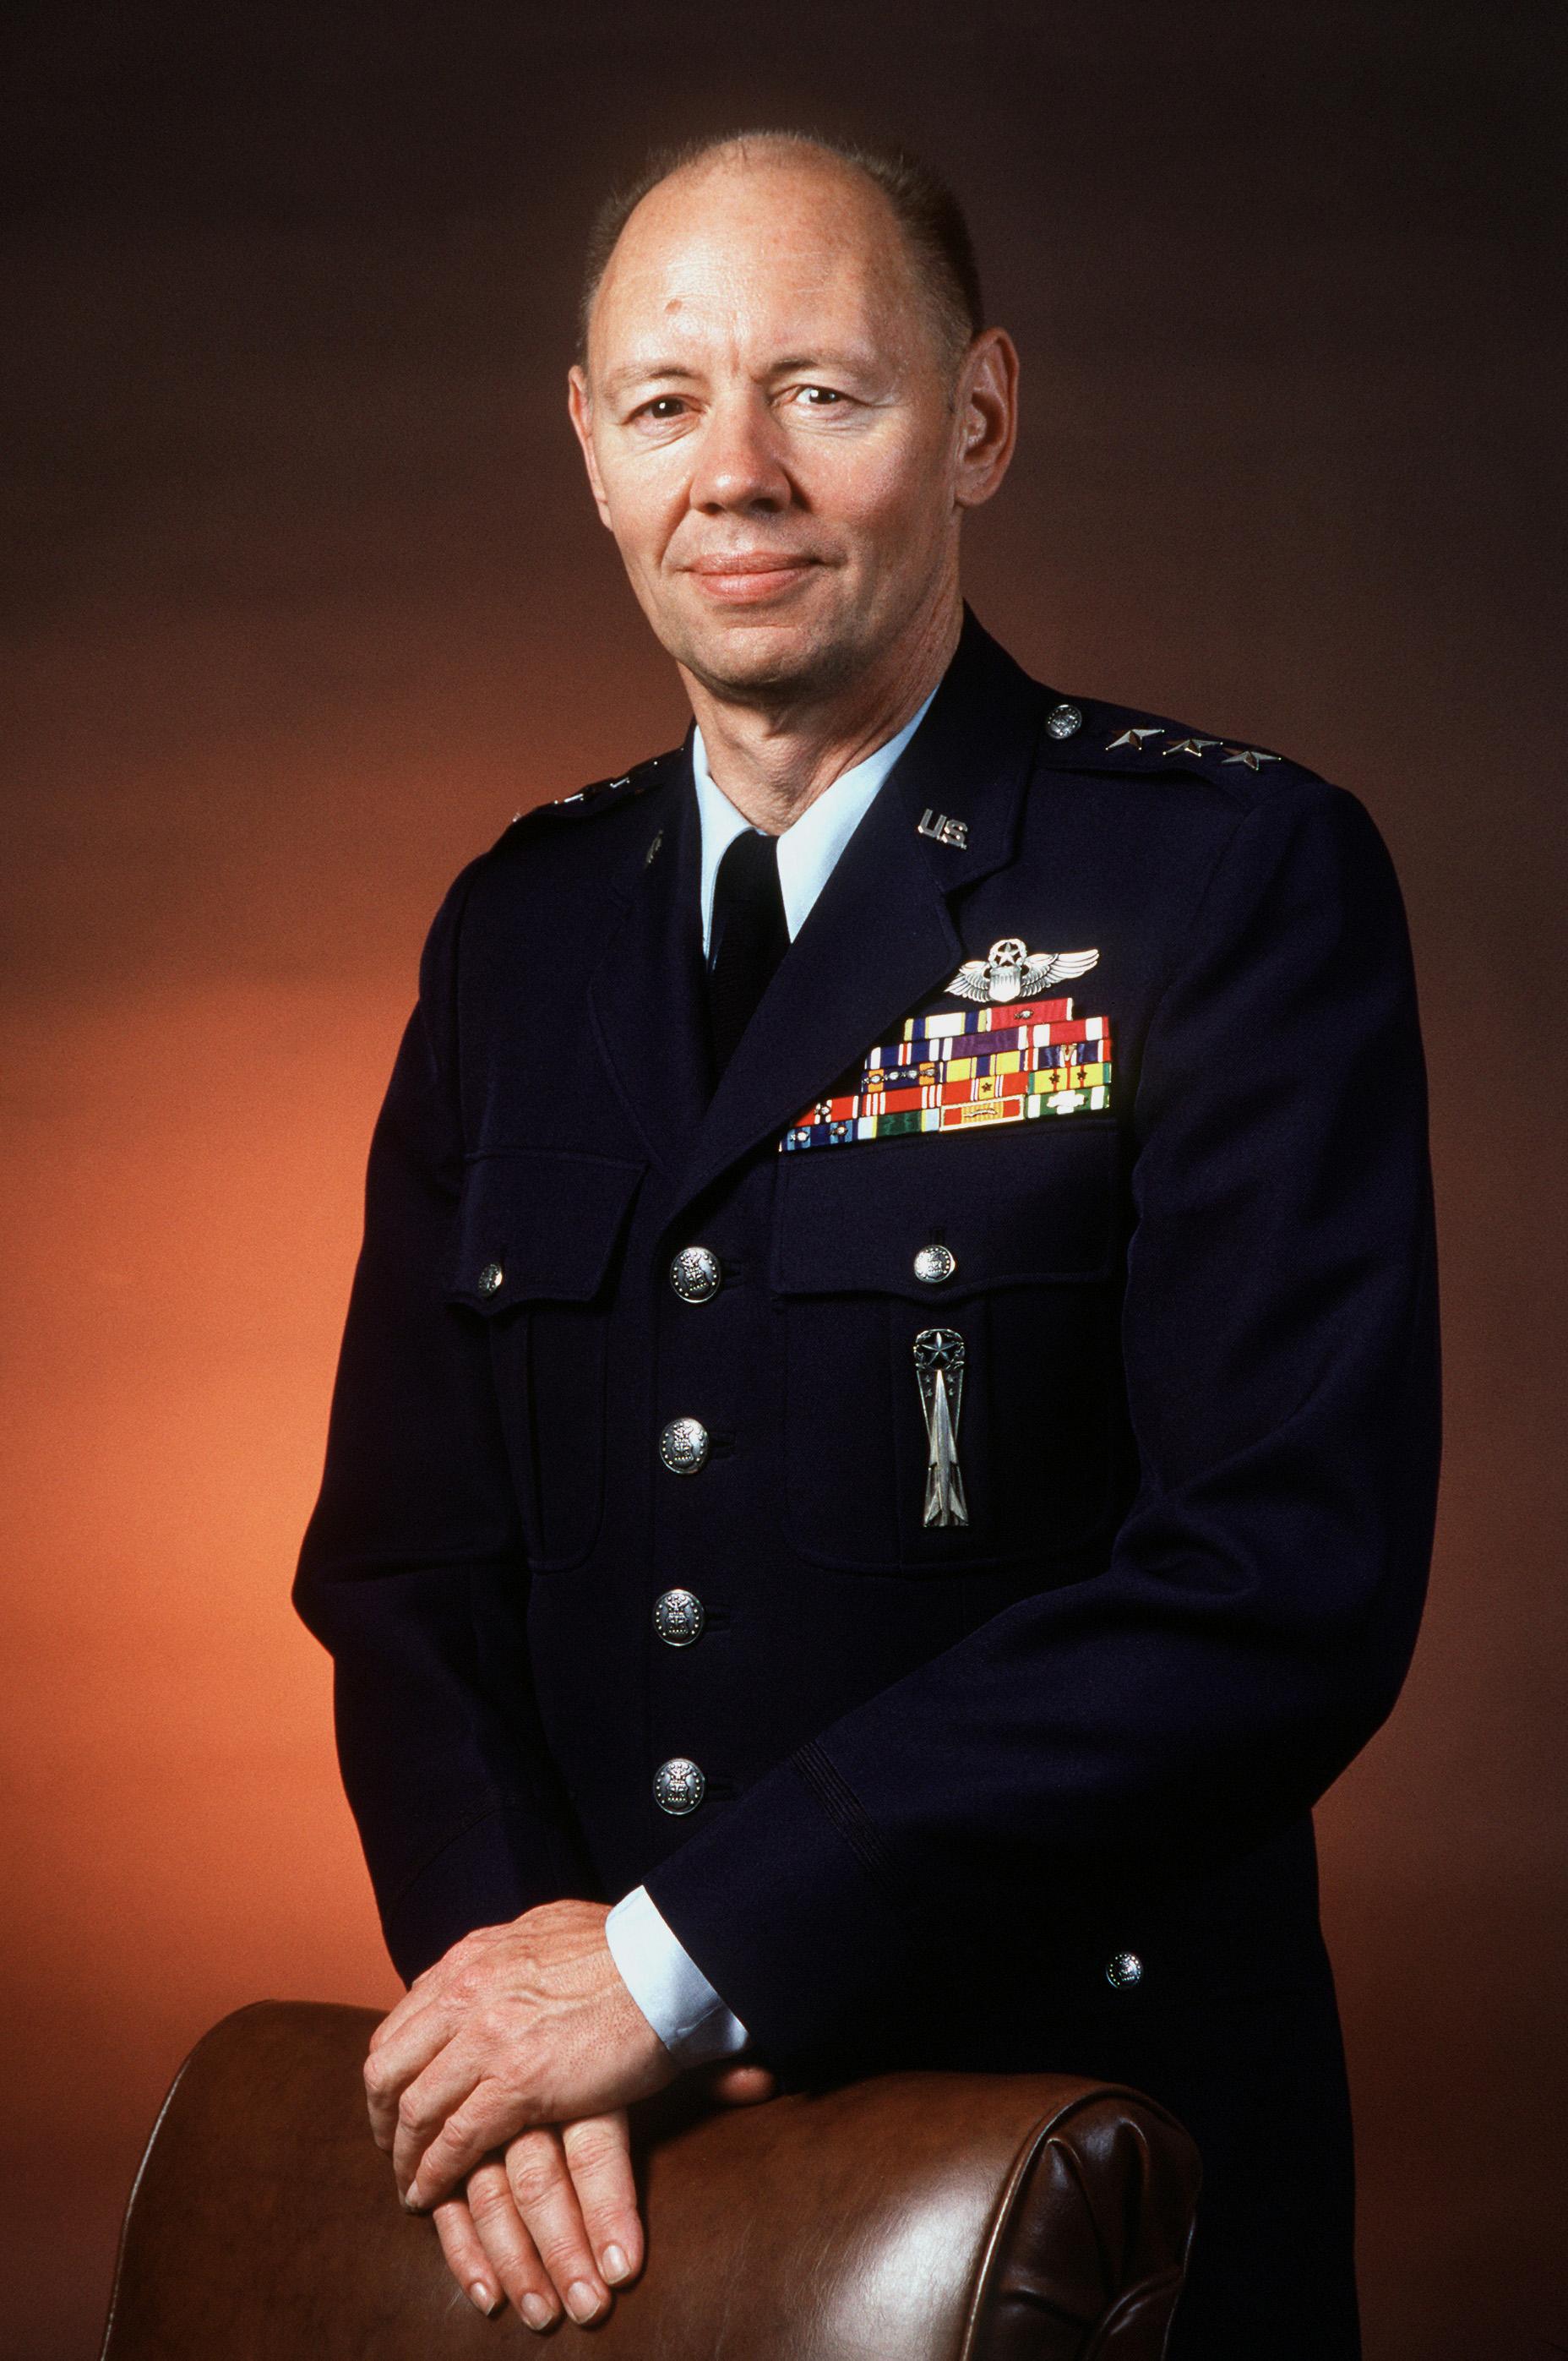 United states military academy preparatory school - testpage